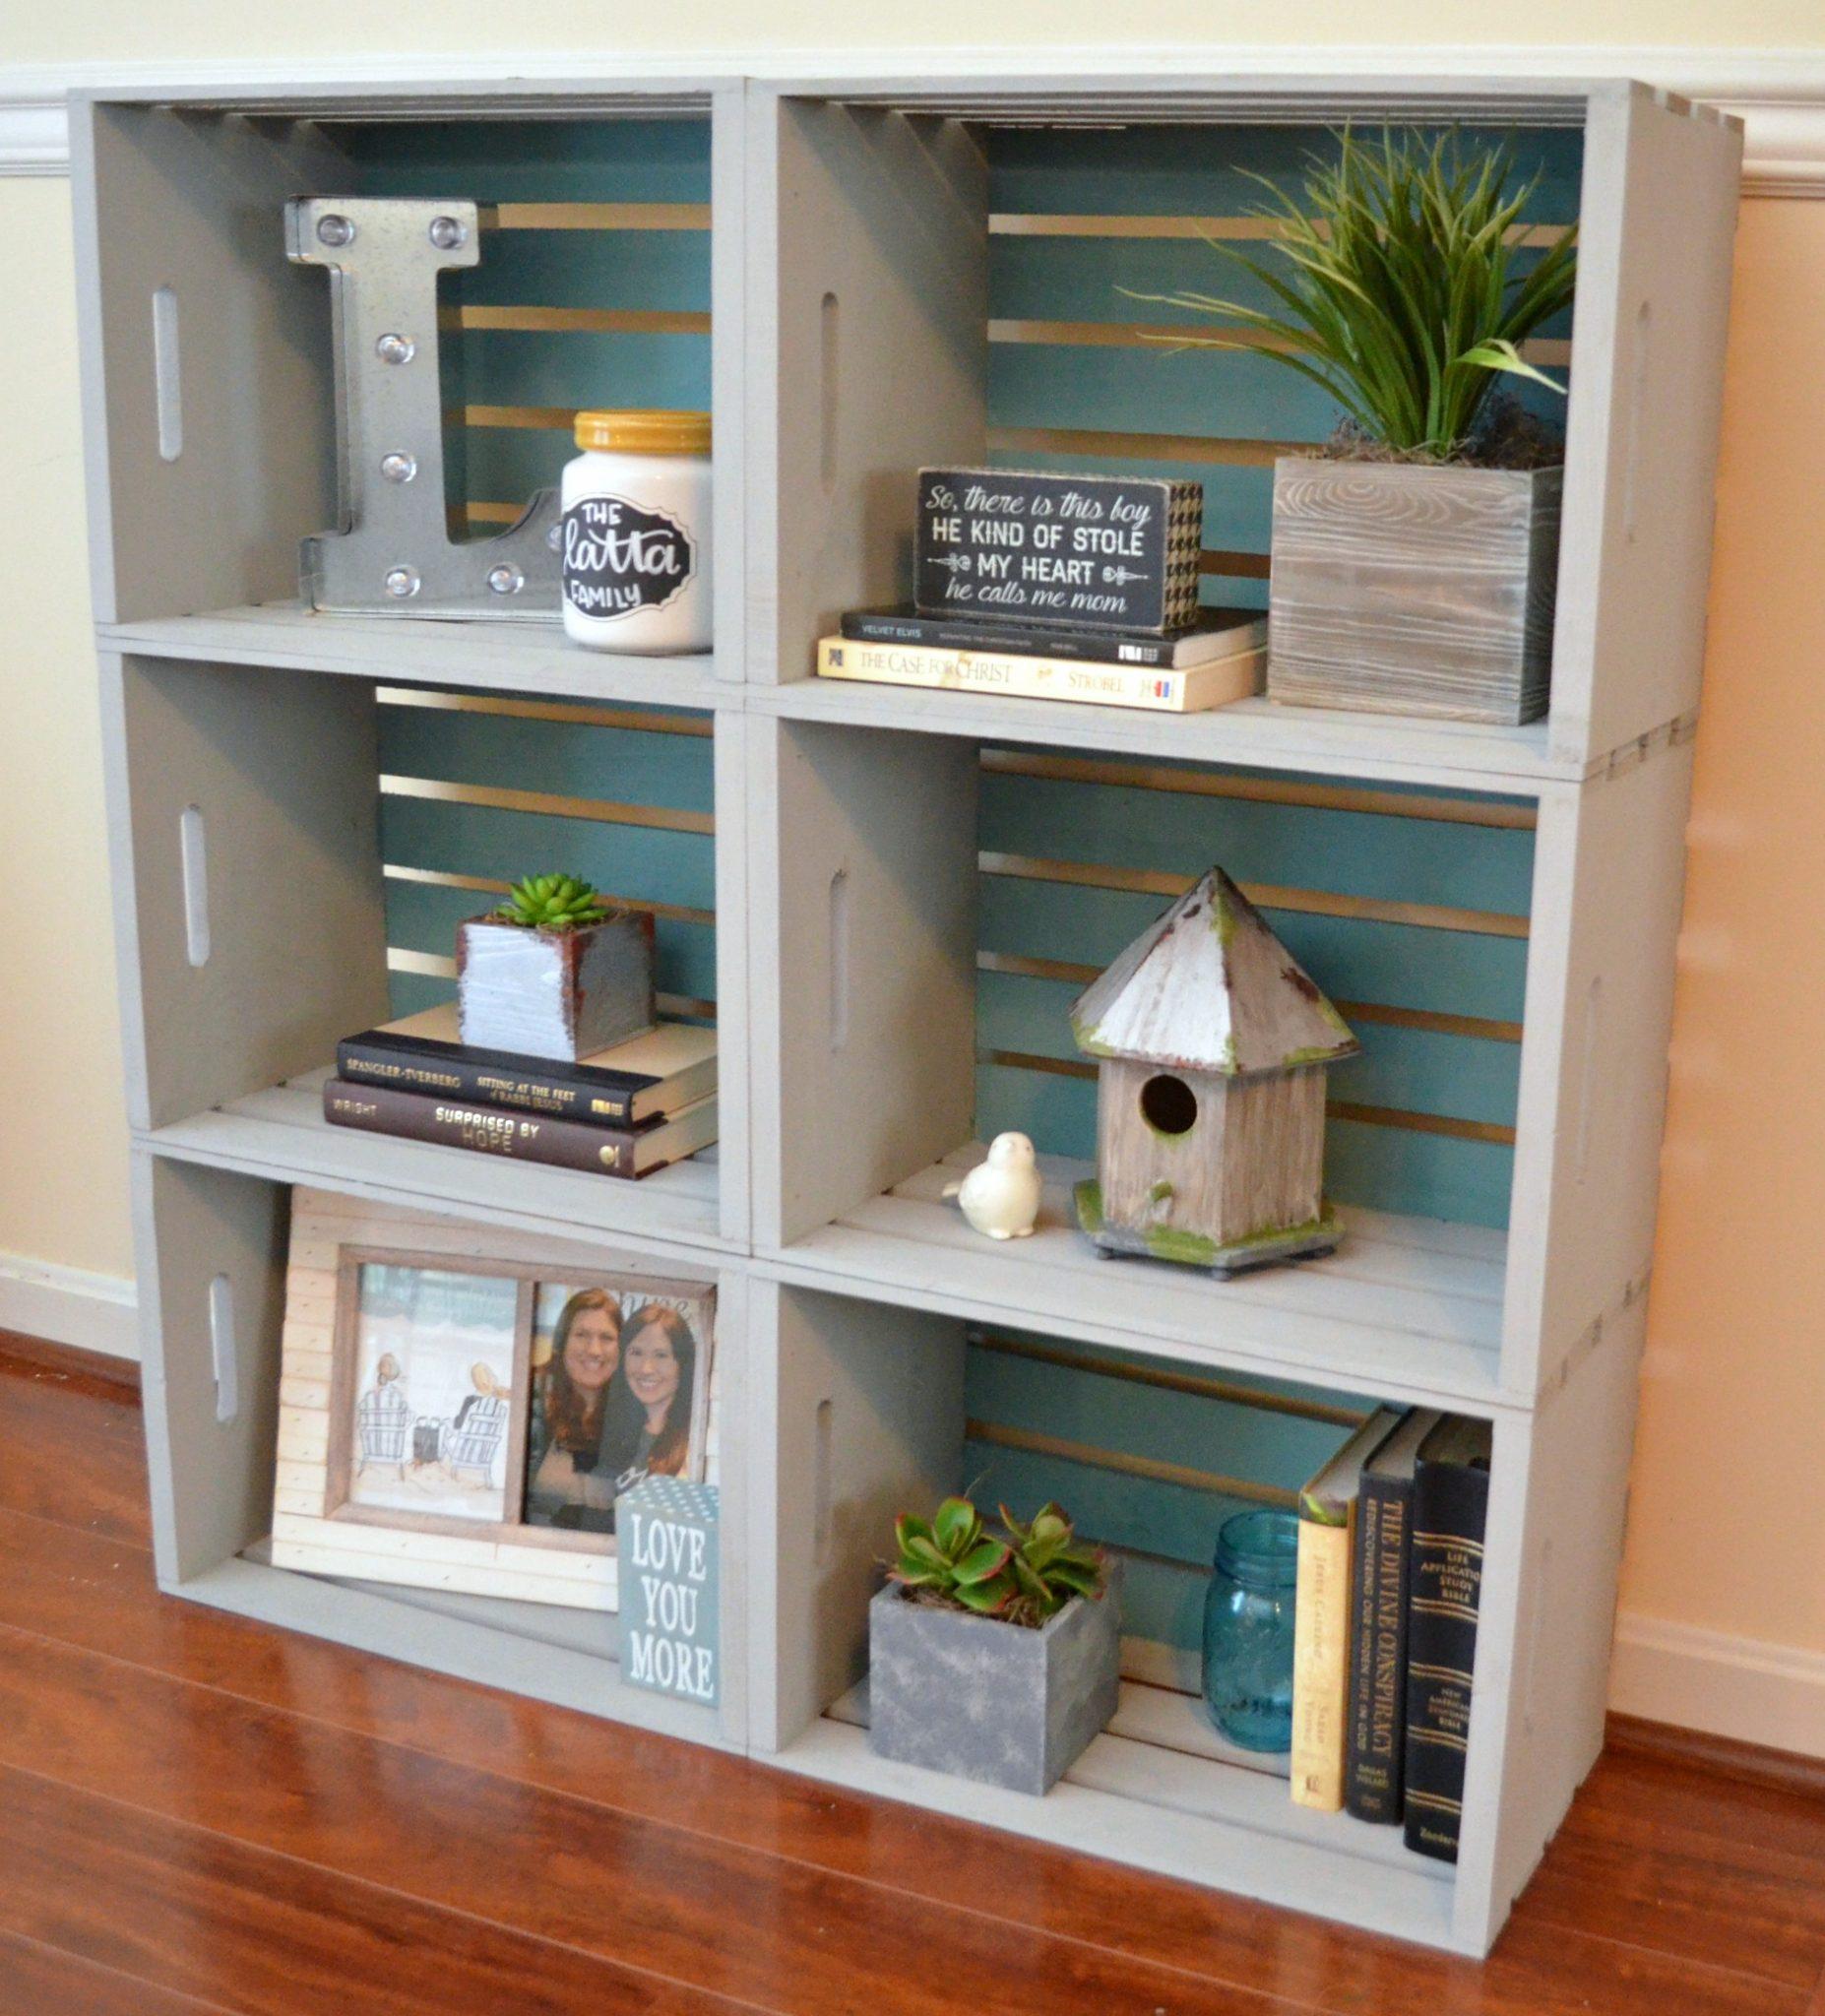 diy crate bookcase - amy latta creations